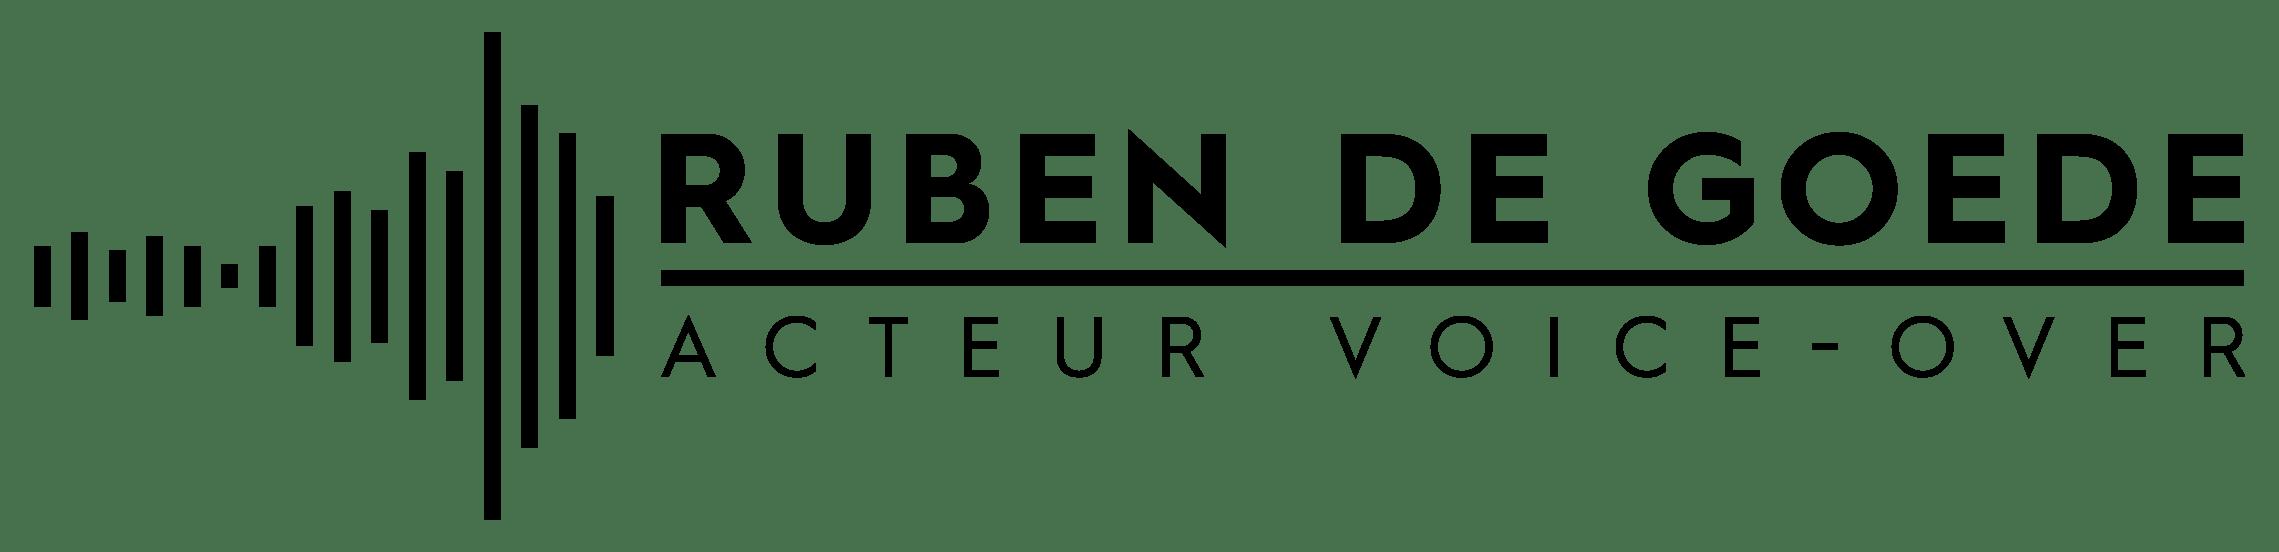 Ruben de Goede